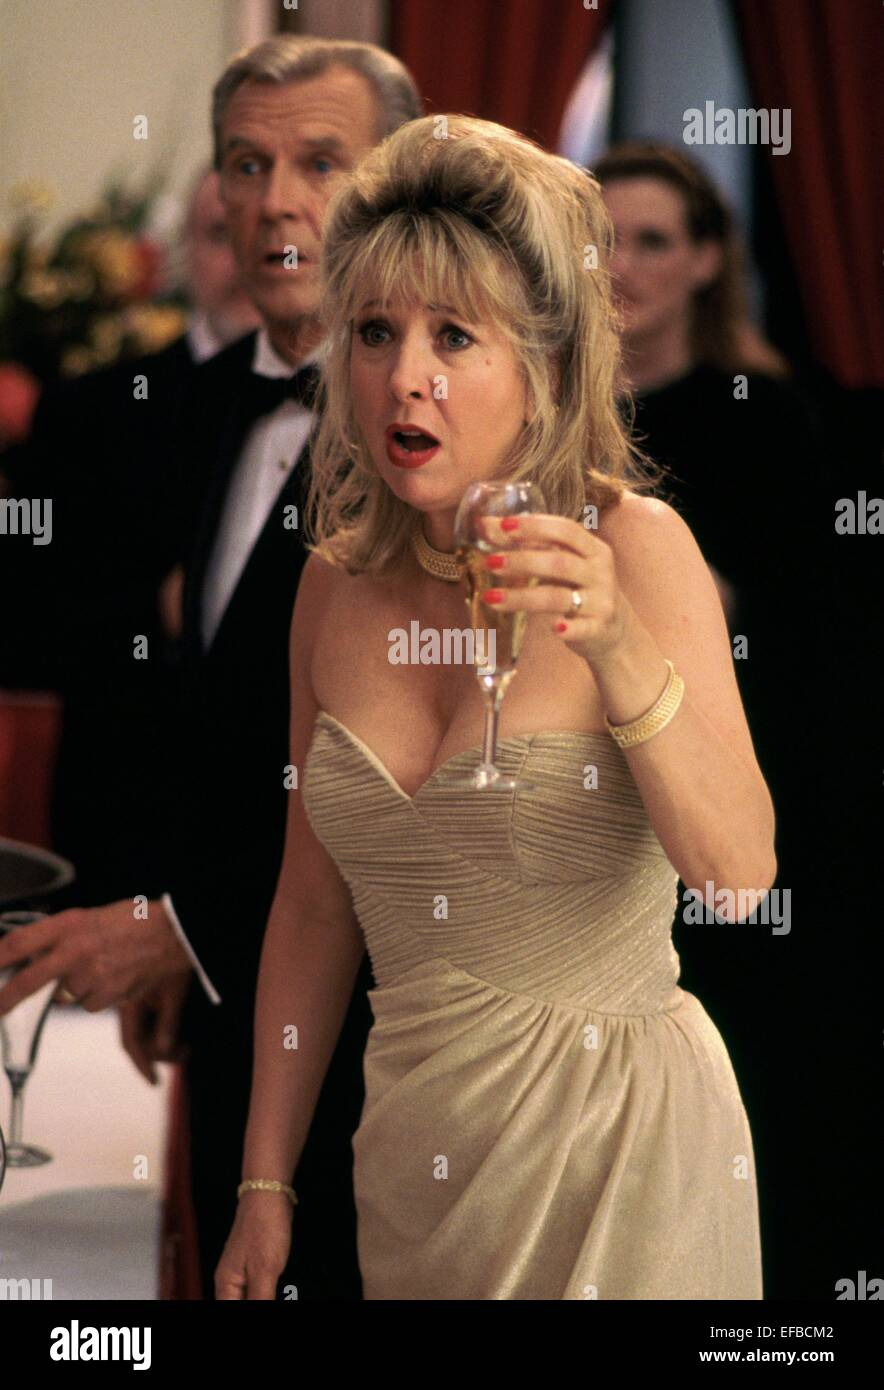 Wendy Richard,Cheyenne Carty GBR 1 2018 Sex pic Jennifer Holmes (actress),Diahnne Abbott